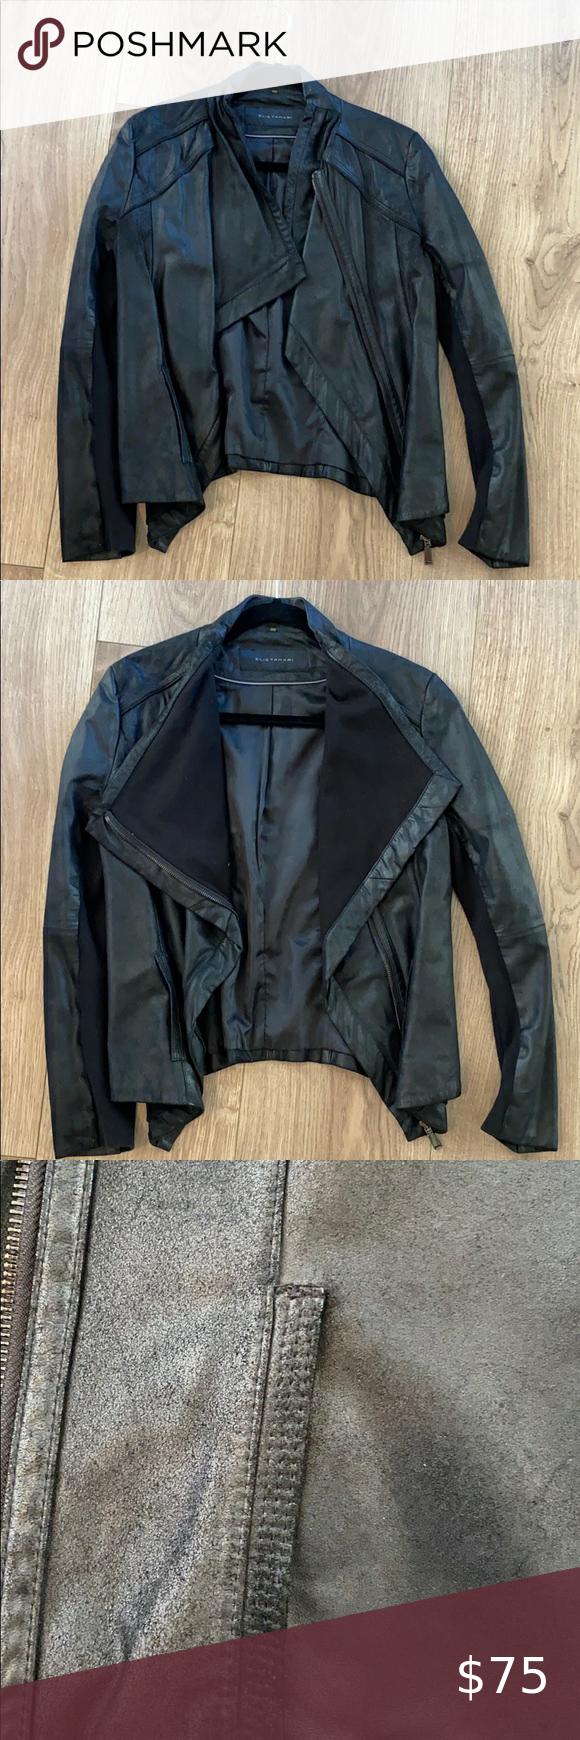 Eli Tahari Leather Jacket Leather Jacket Jackets Clothes Design [ 1740 x 580 Pixel ]